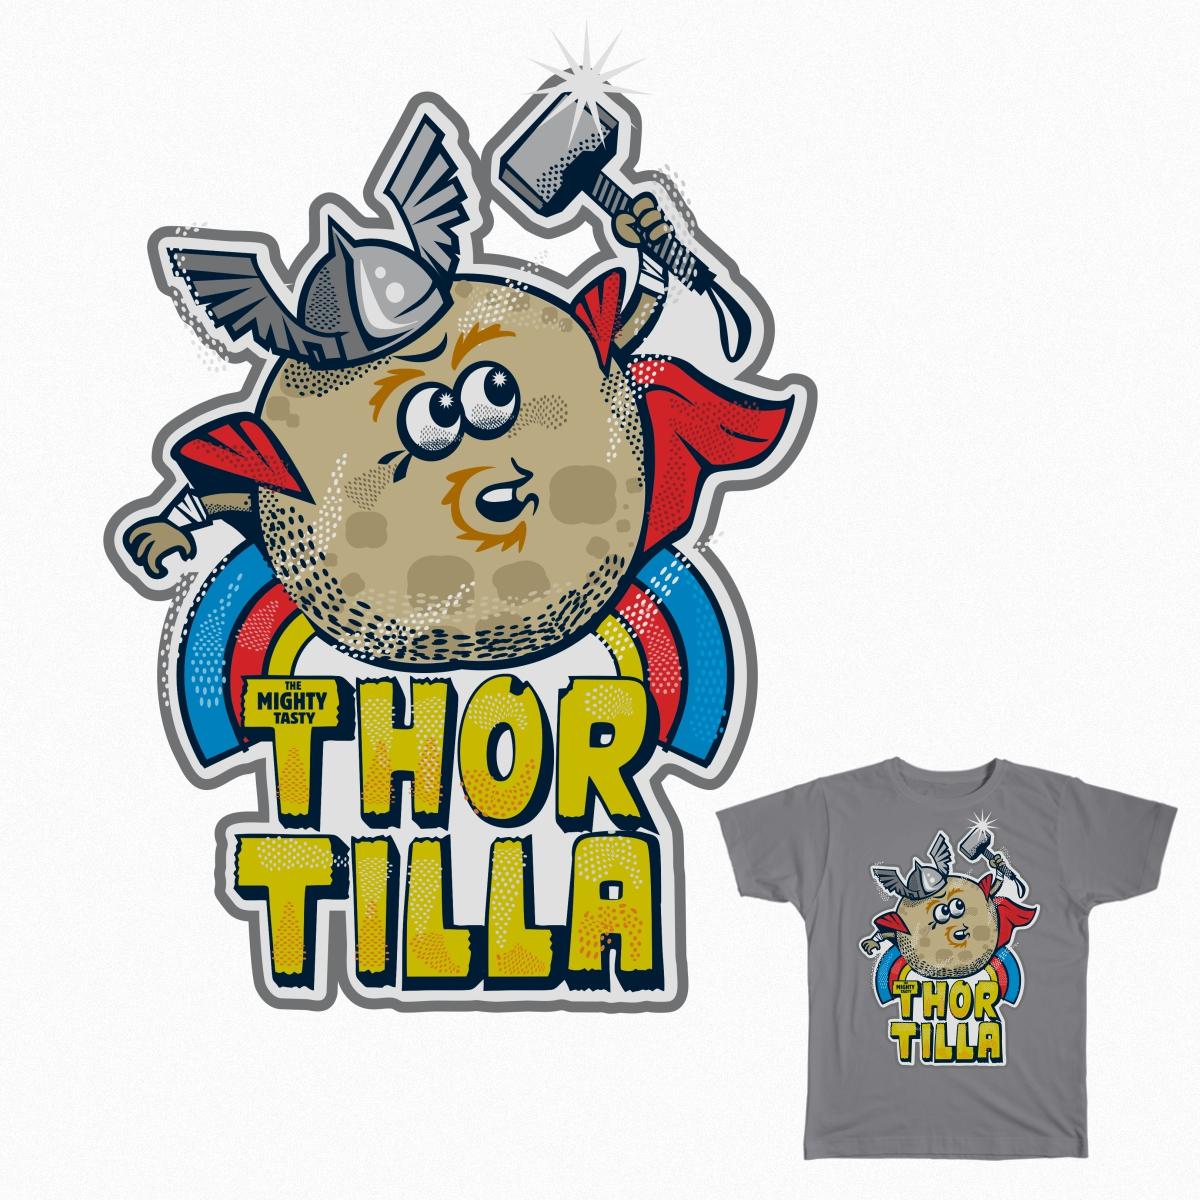 Thortilla!!! by damichi75 on Threadless